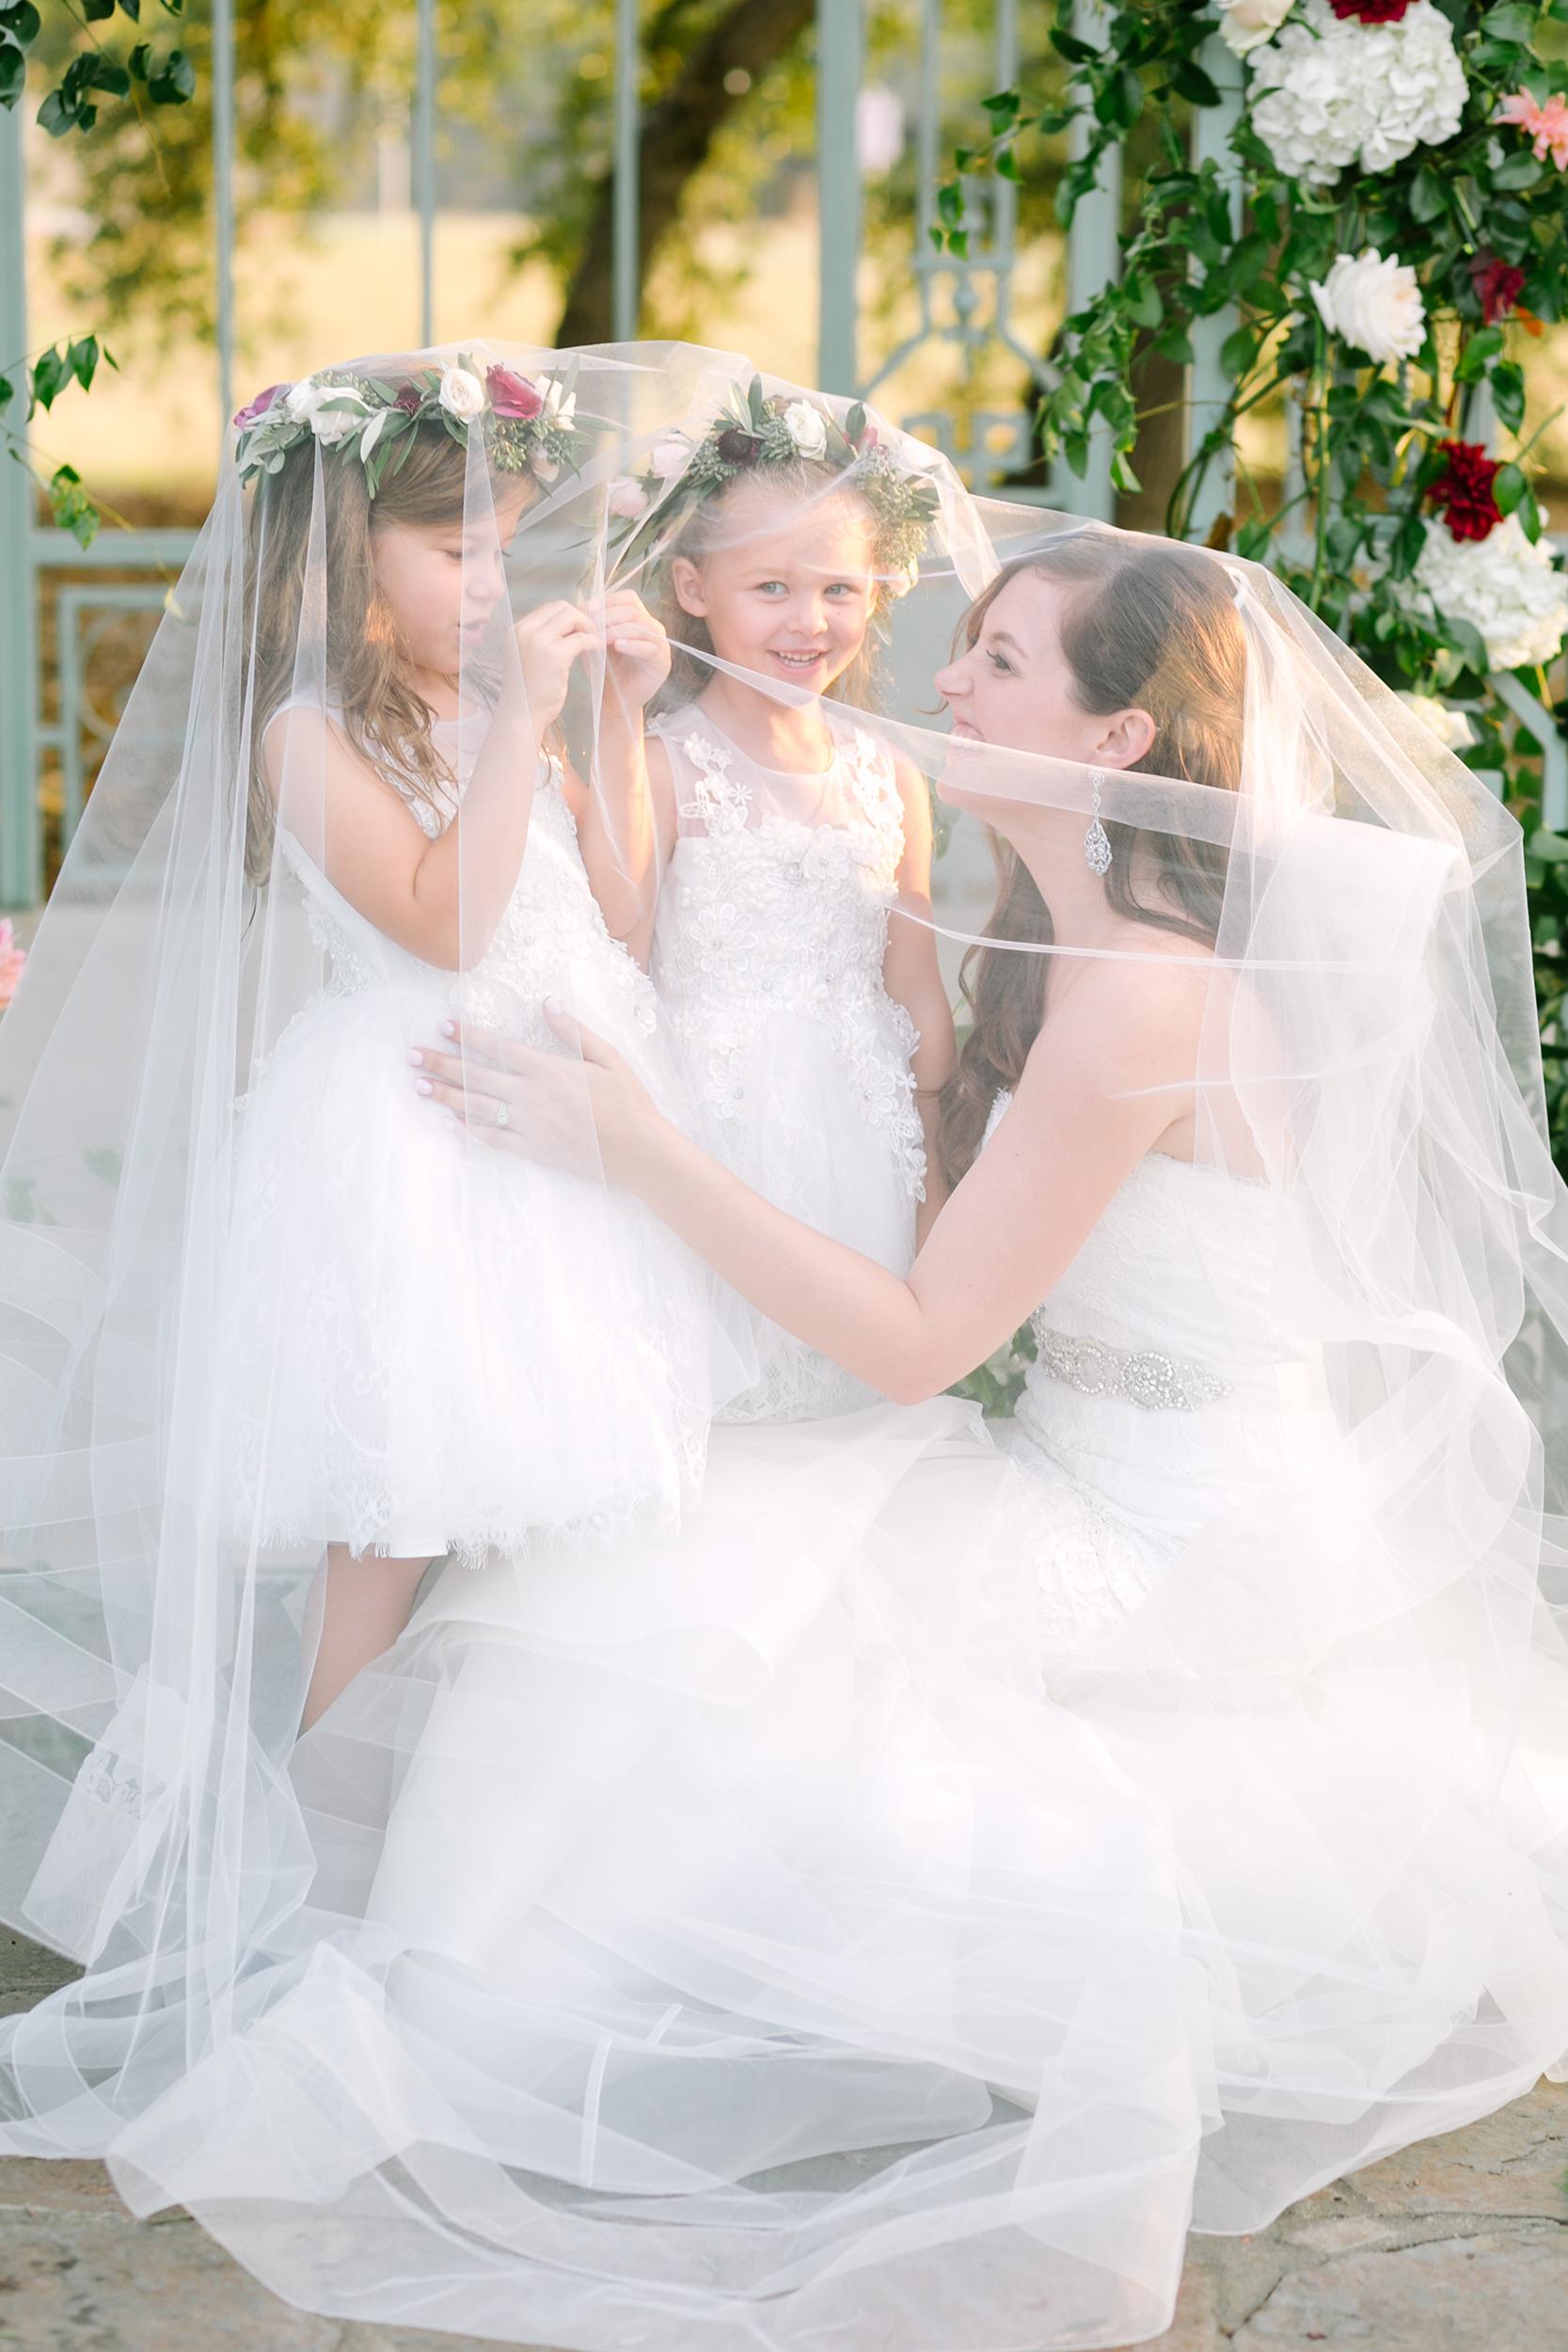 Austin_Wedding_Photographer_Kimberly_Brooke_Photographic_087.jpg